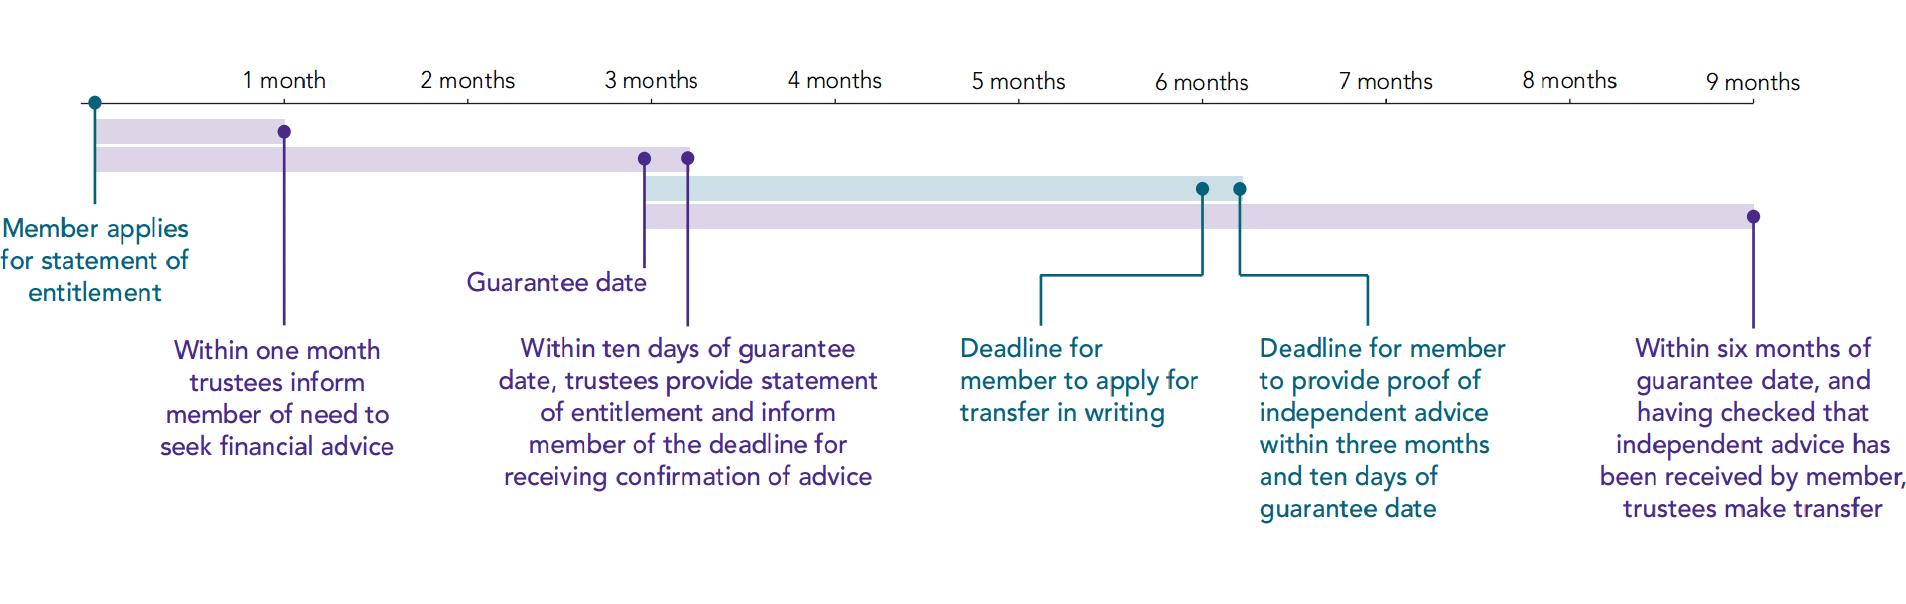 timeline-statutory-transfers-2015